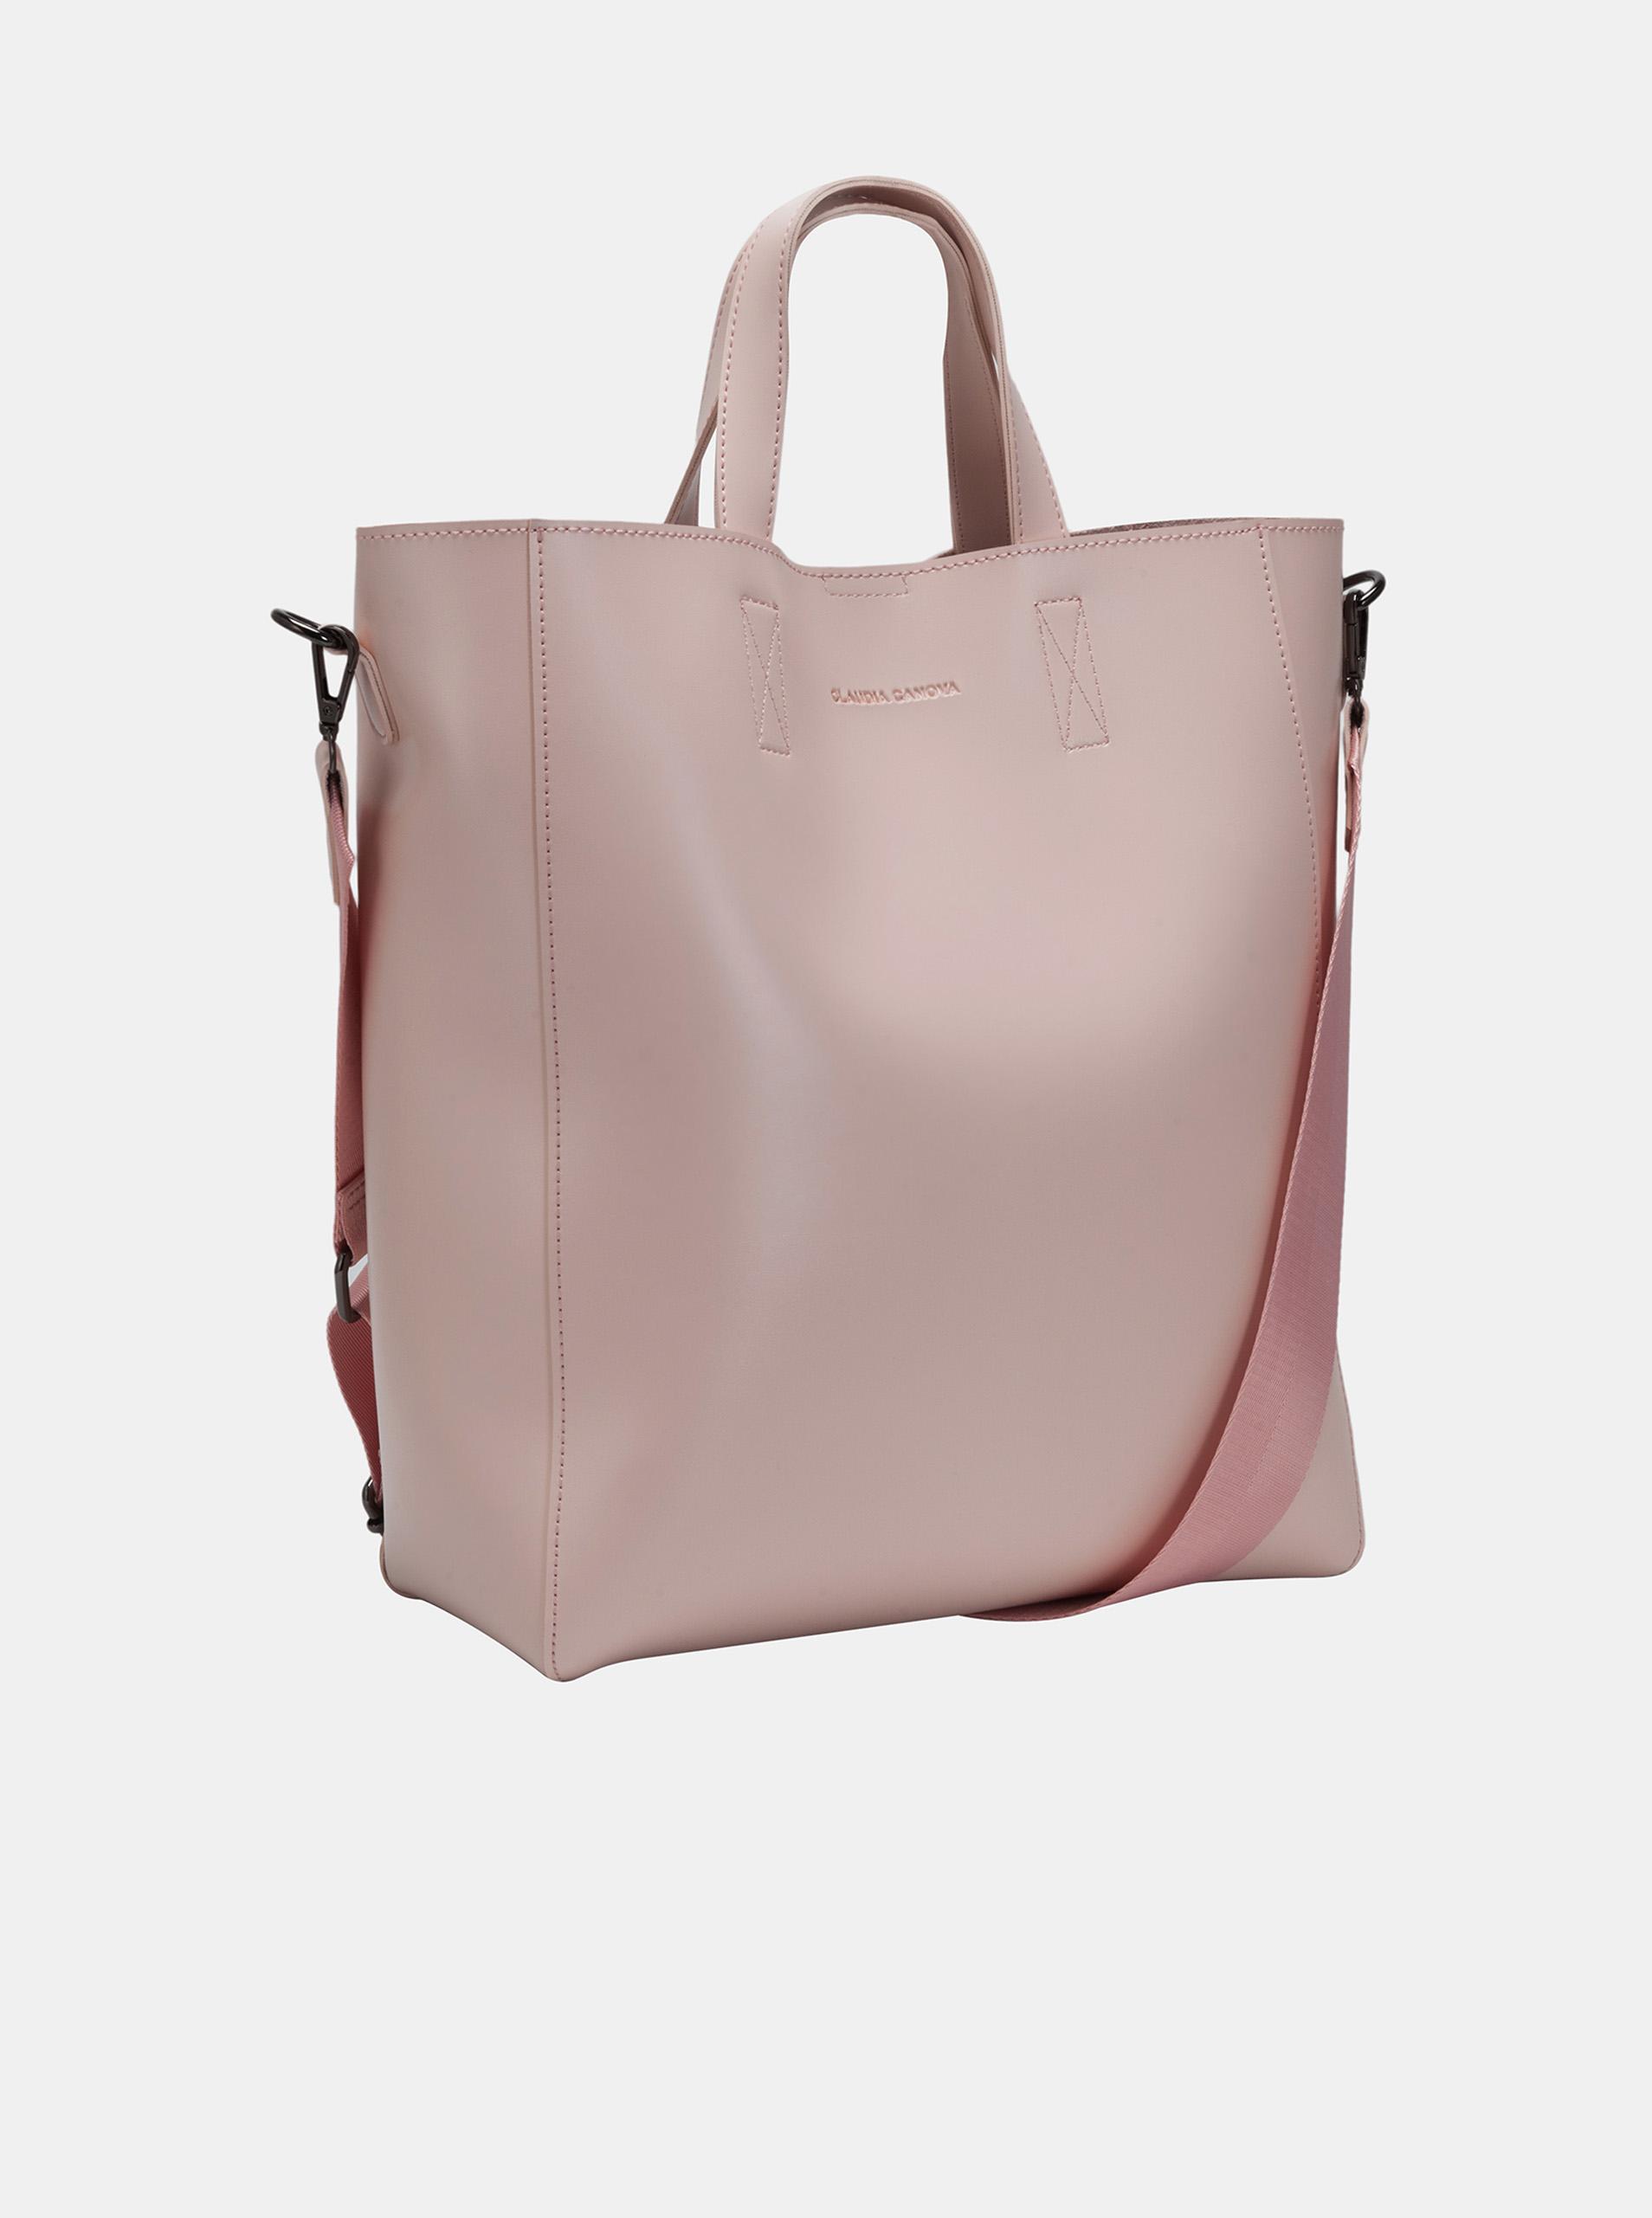 Claudia Canova pink large handbag